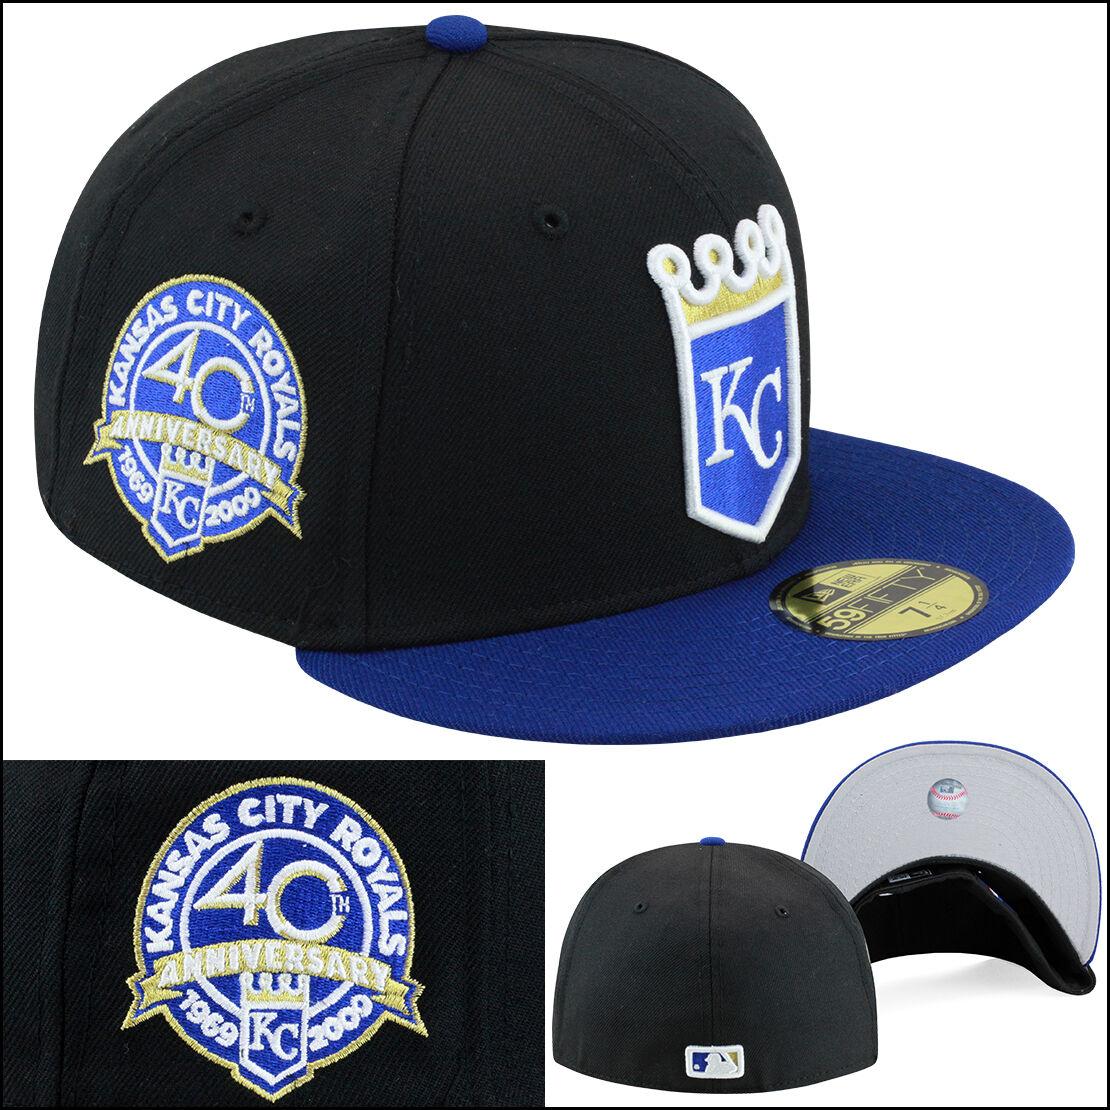 super popular 1b186 ec6d0 ireland new era kansas city kc royals fitted hat black royal gold 40th  anniversary e2c90 b292b